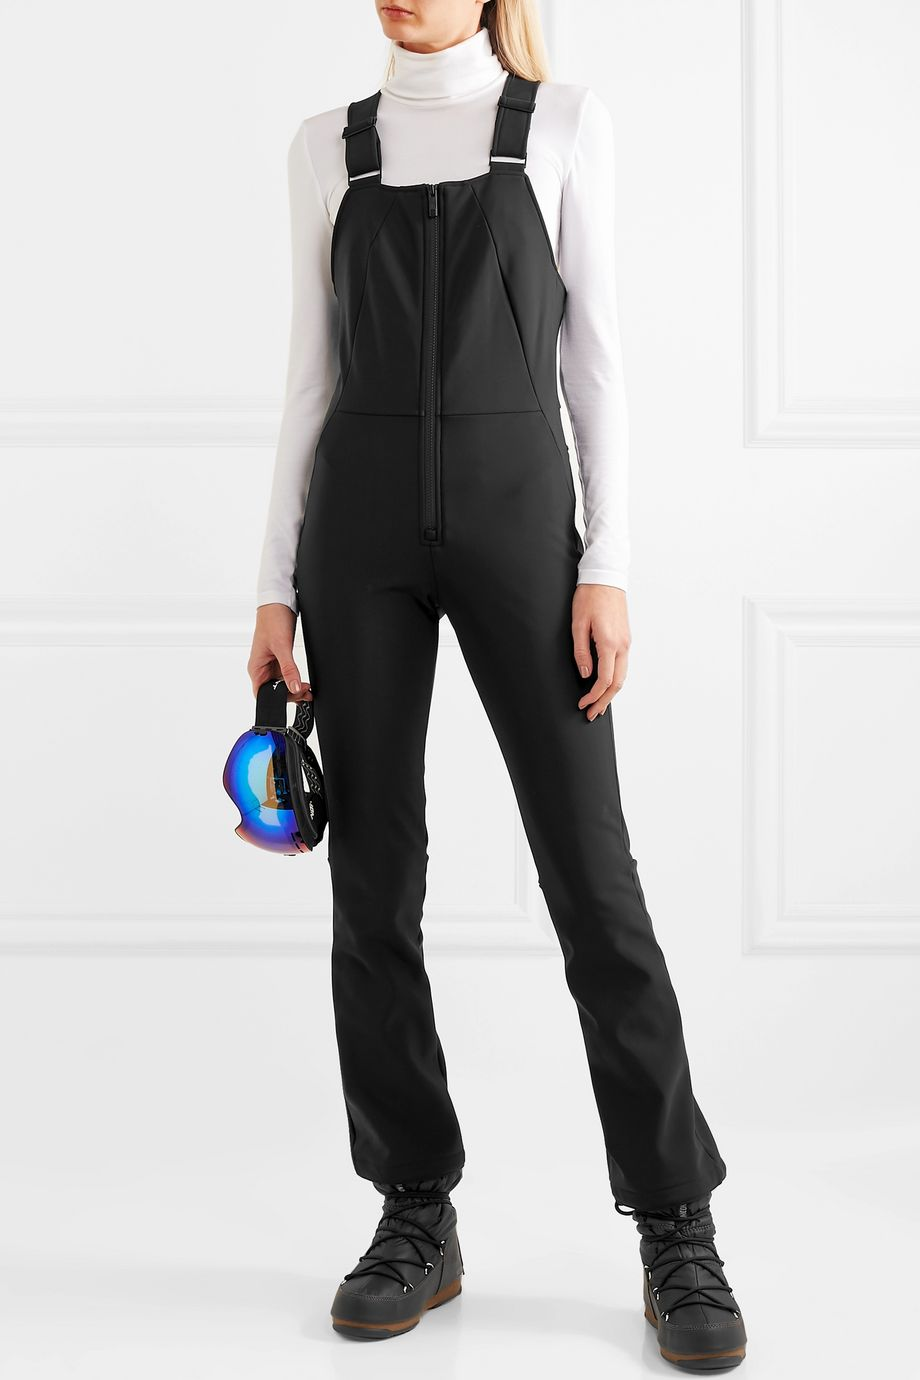 Fusalp Badia stretch ski suit